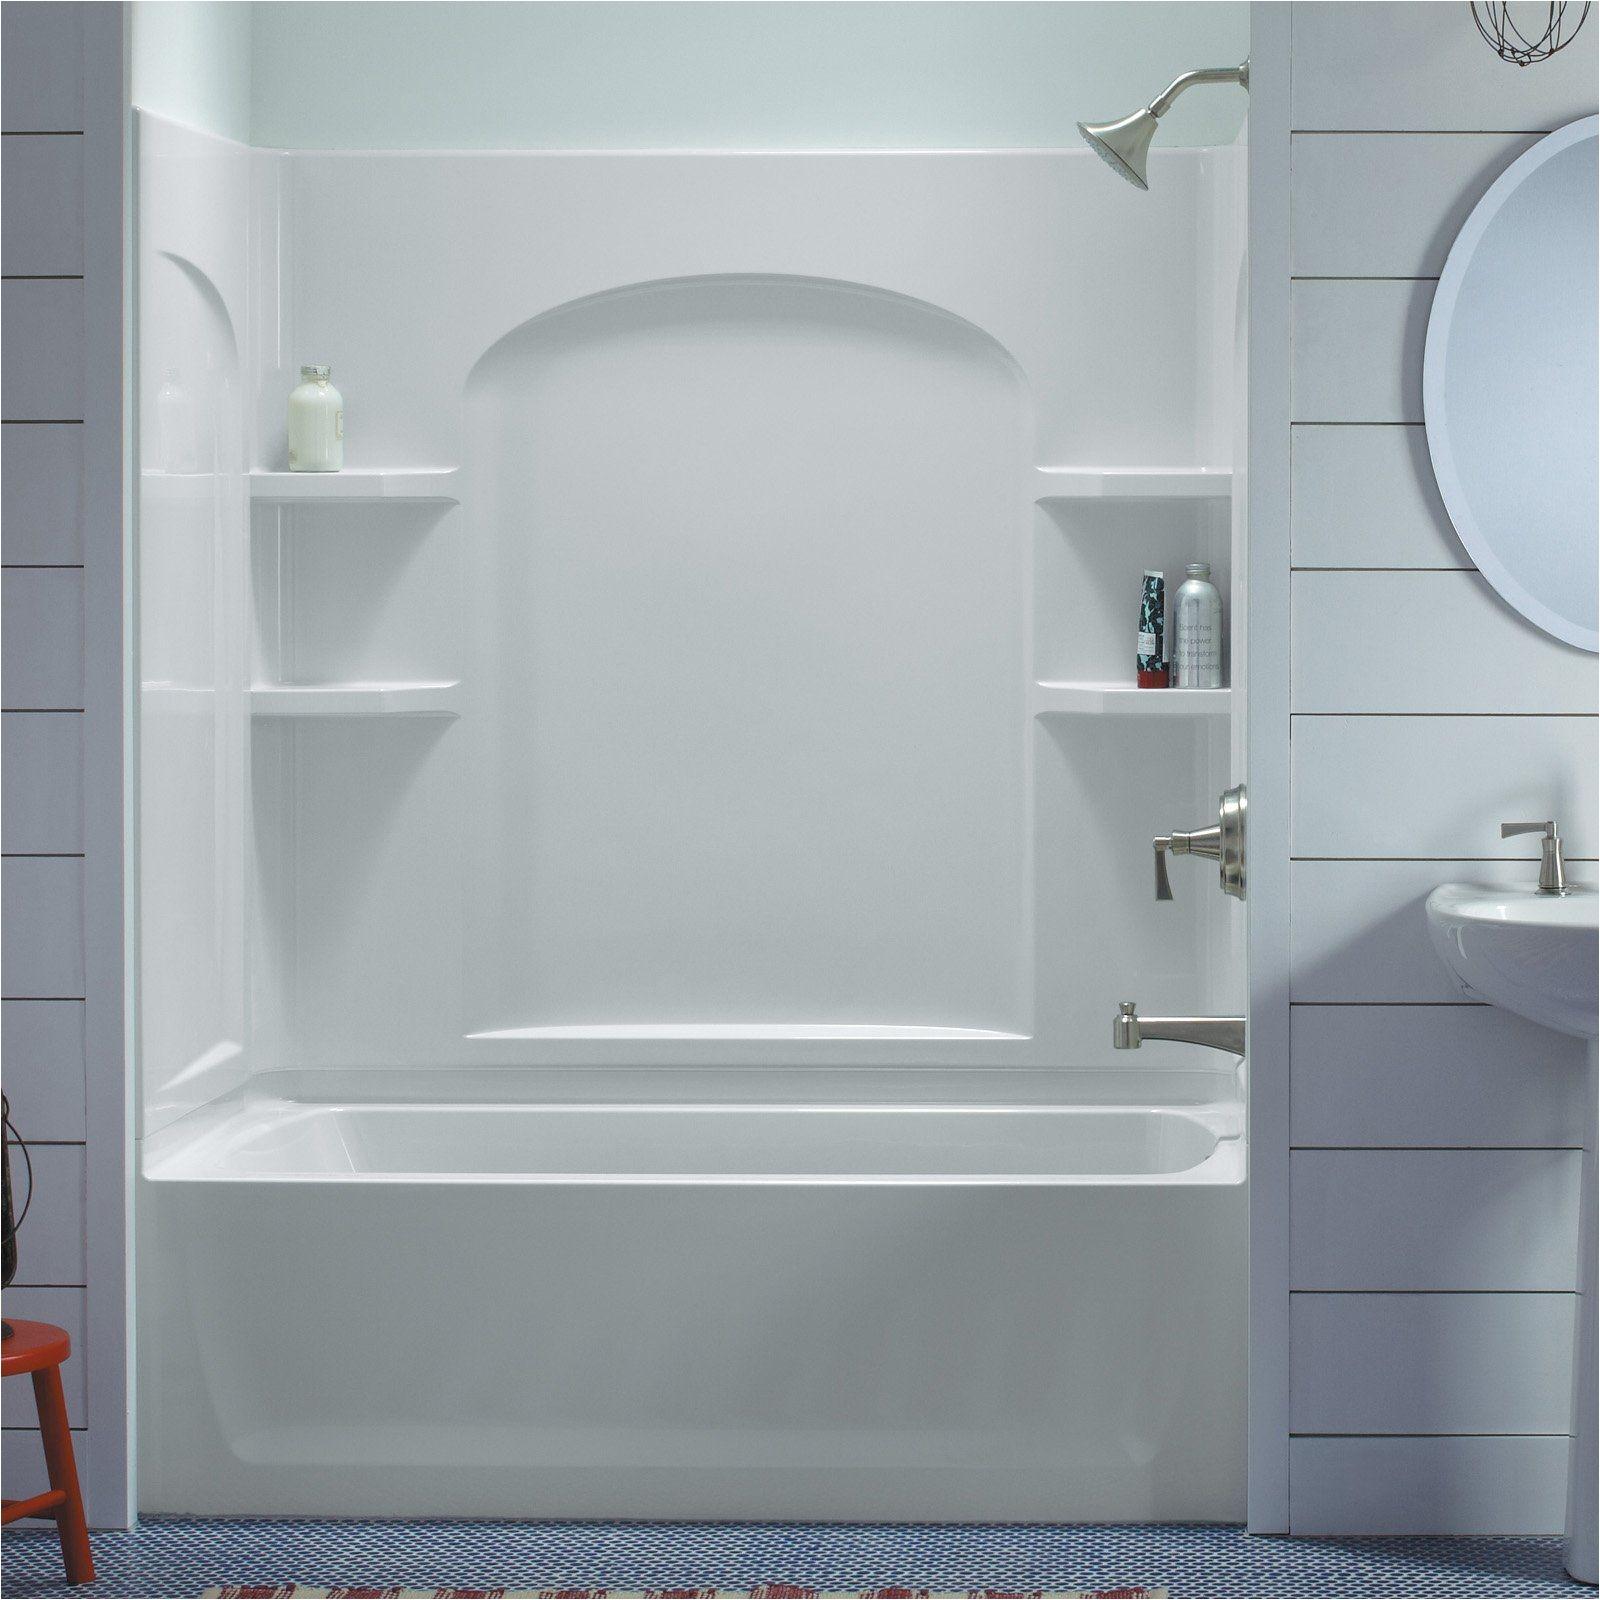 sterling ensemblea¢a¢ 60w x 74h in curve bathtub shower bo 811 99